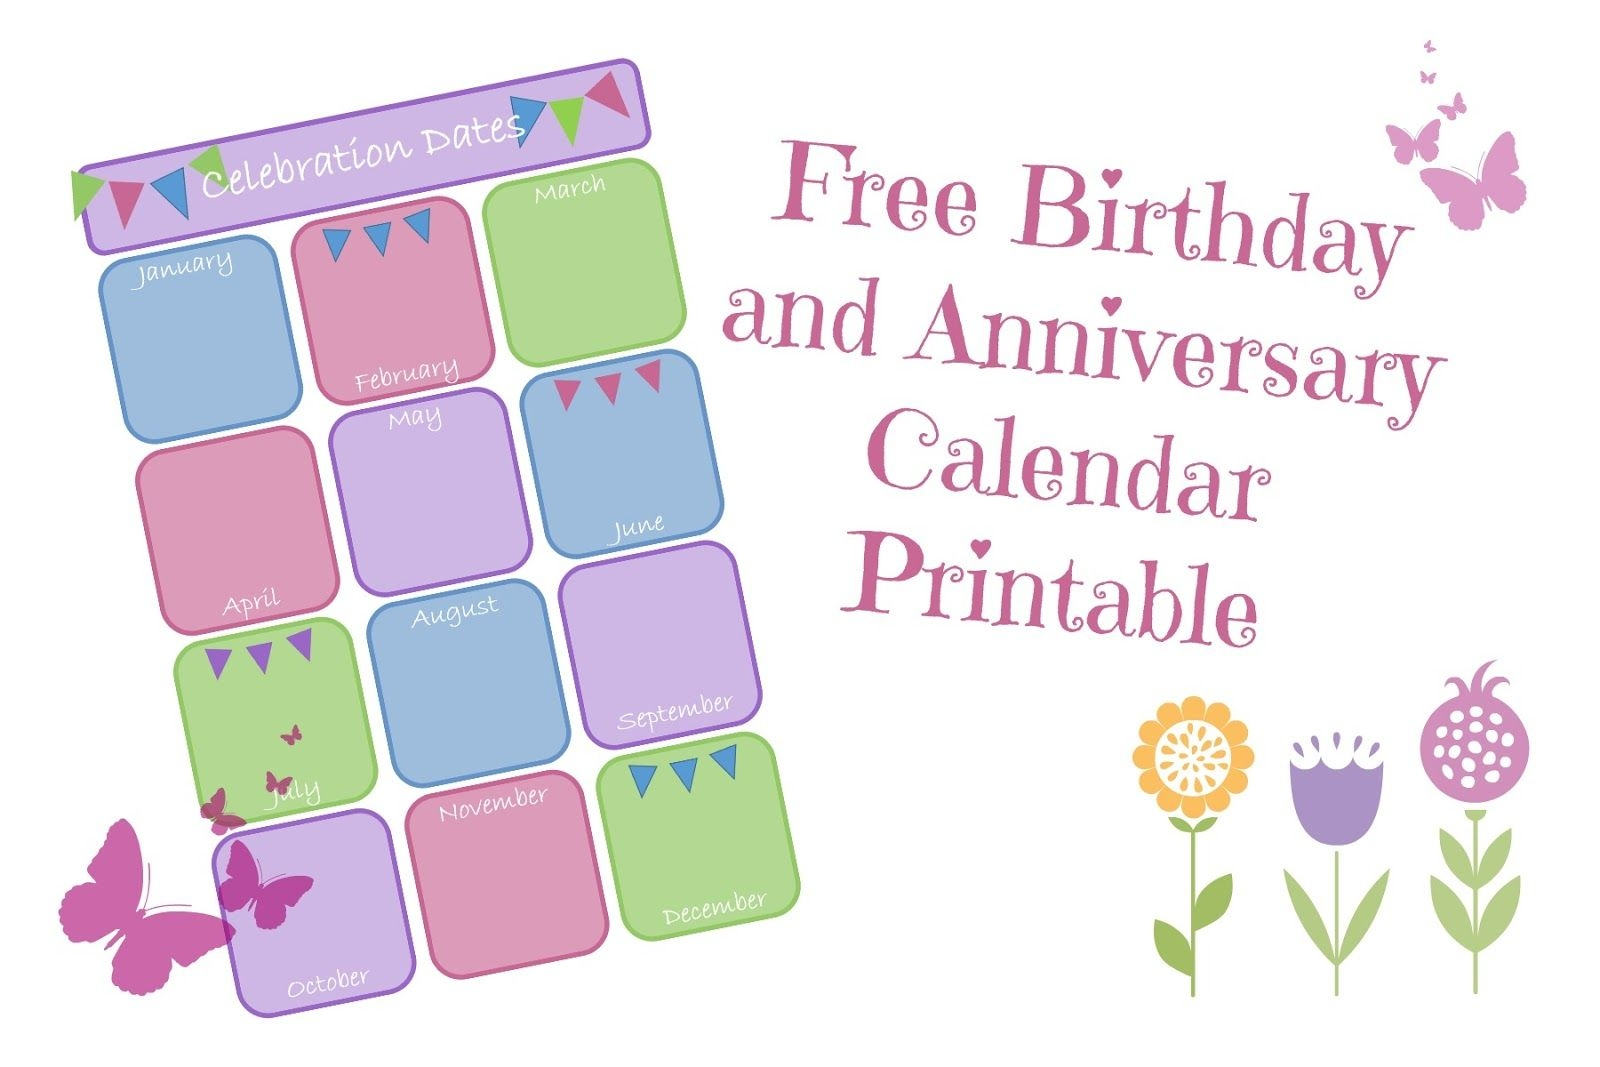 Adoorabell: Perpetual Birthday And Anniversary Calendar